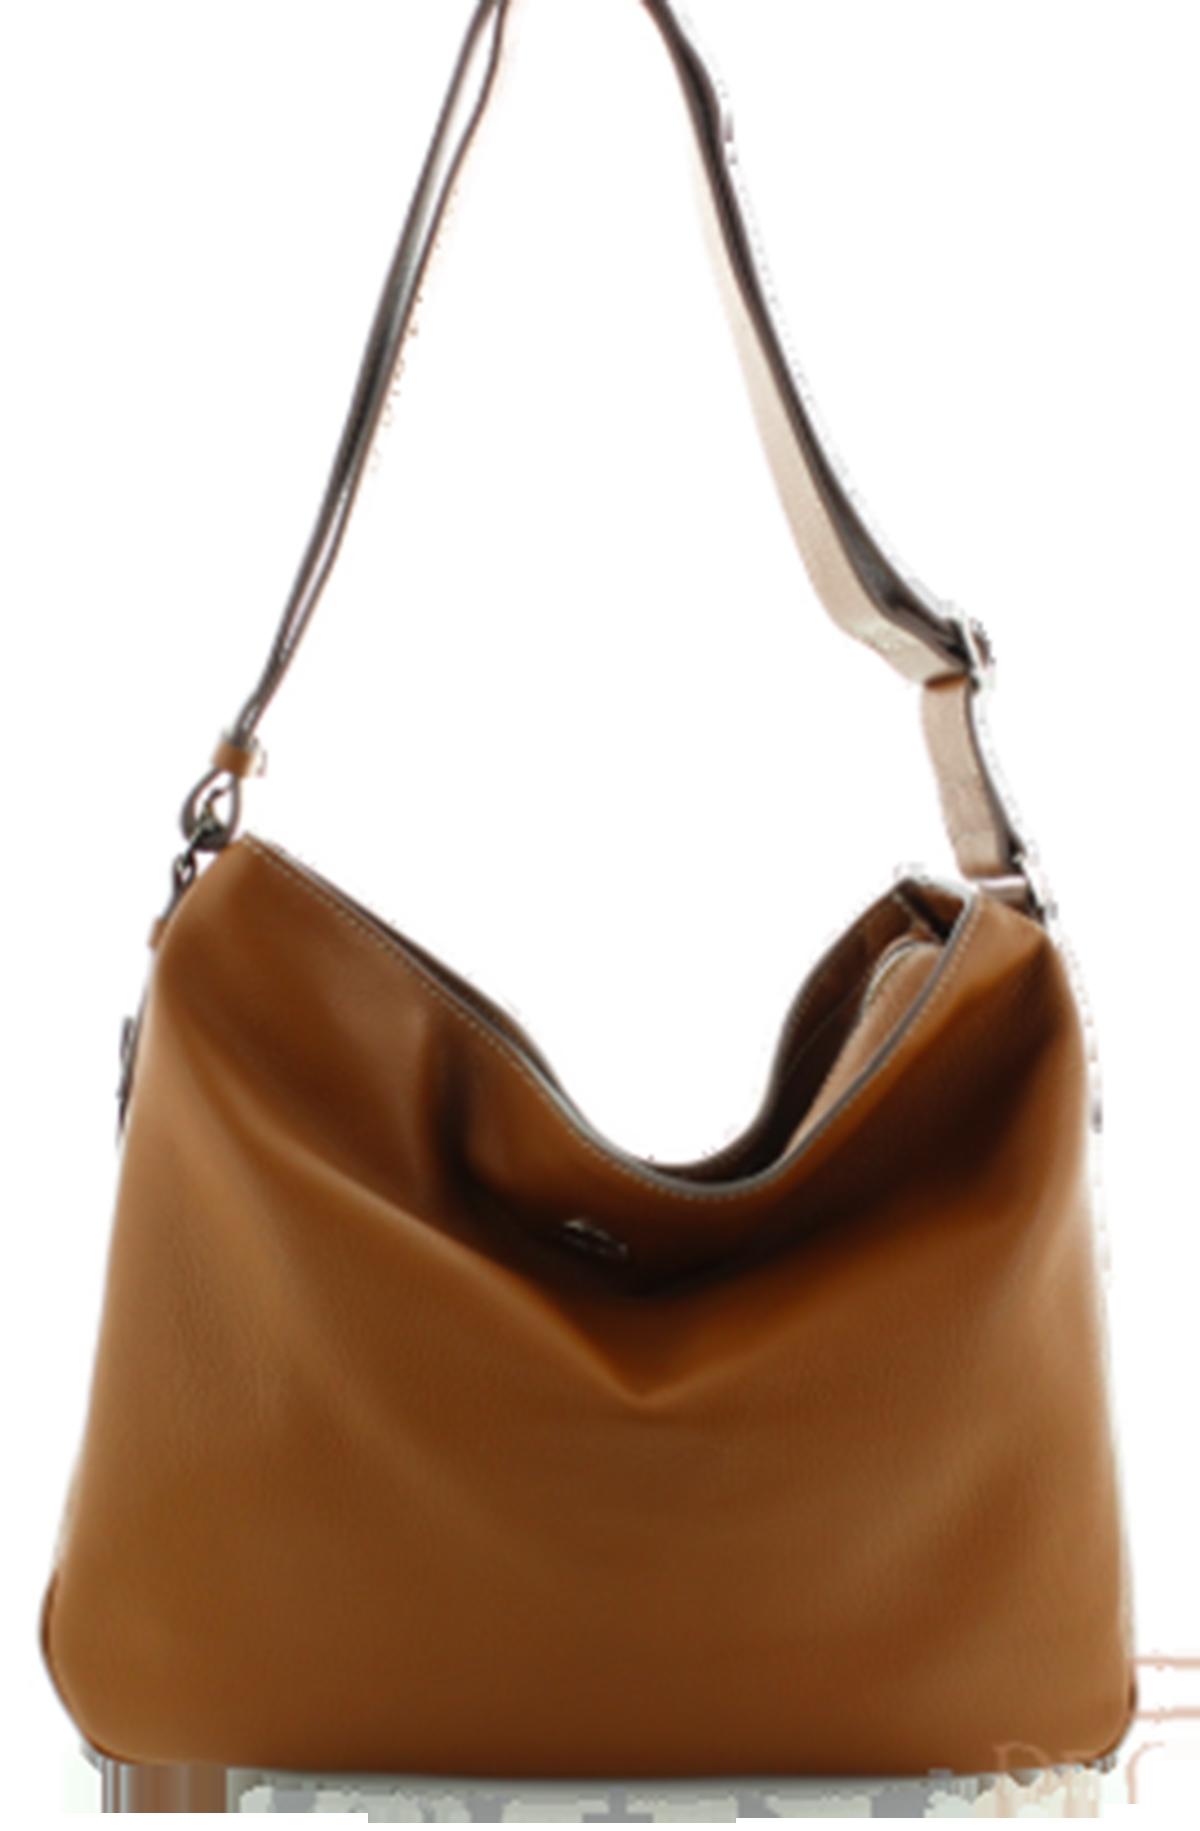 Gamme de sac besace - Francuir - Francuir 14b4020d1f0